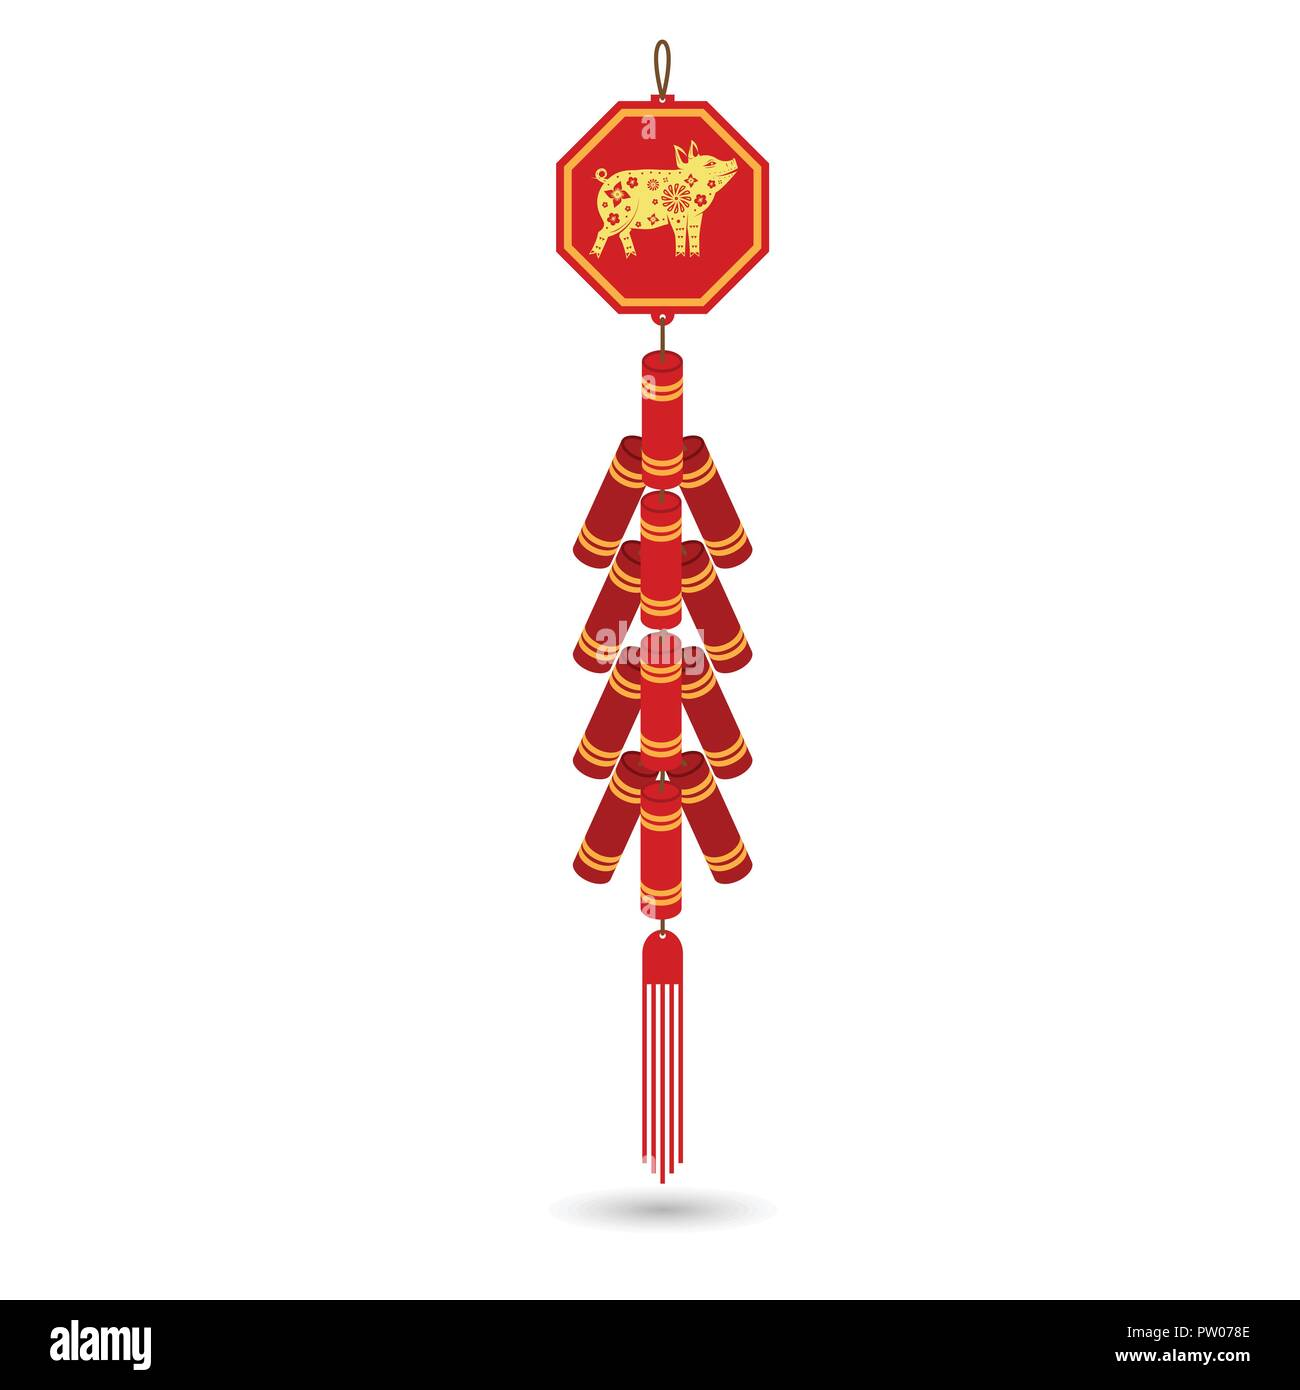 Red chinese firecracker flat icon. Vector illustration. Red fire cracker art design. Stock Vector